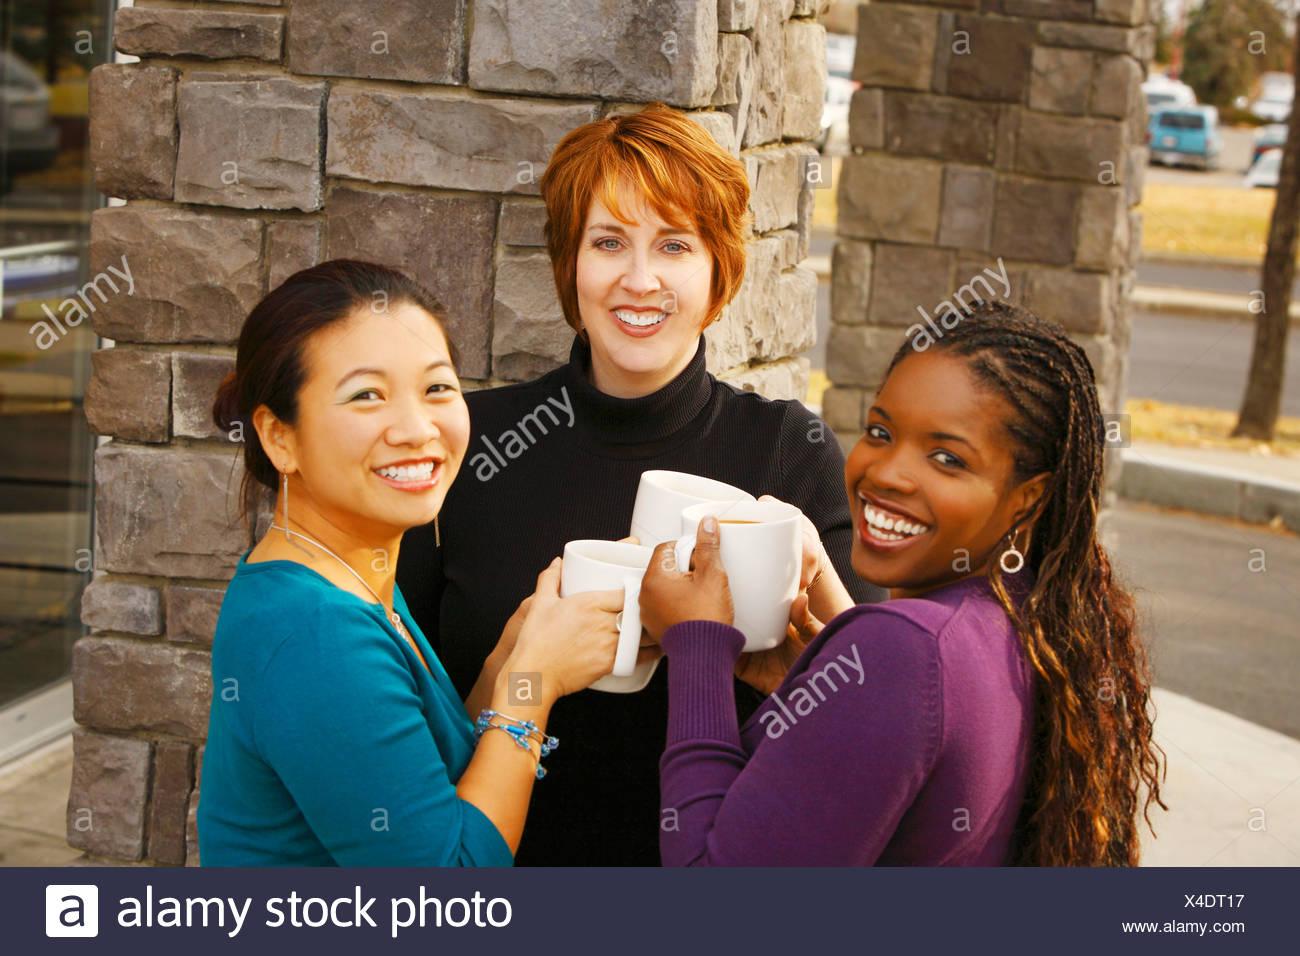 Three women celebrating together - Stock Image